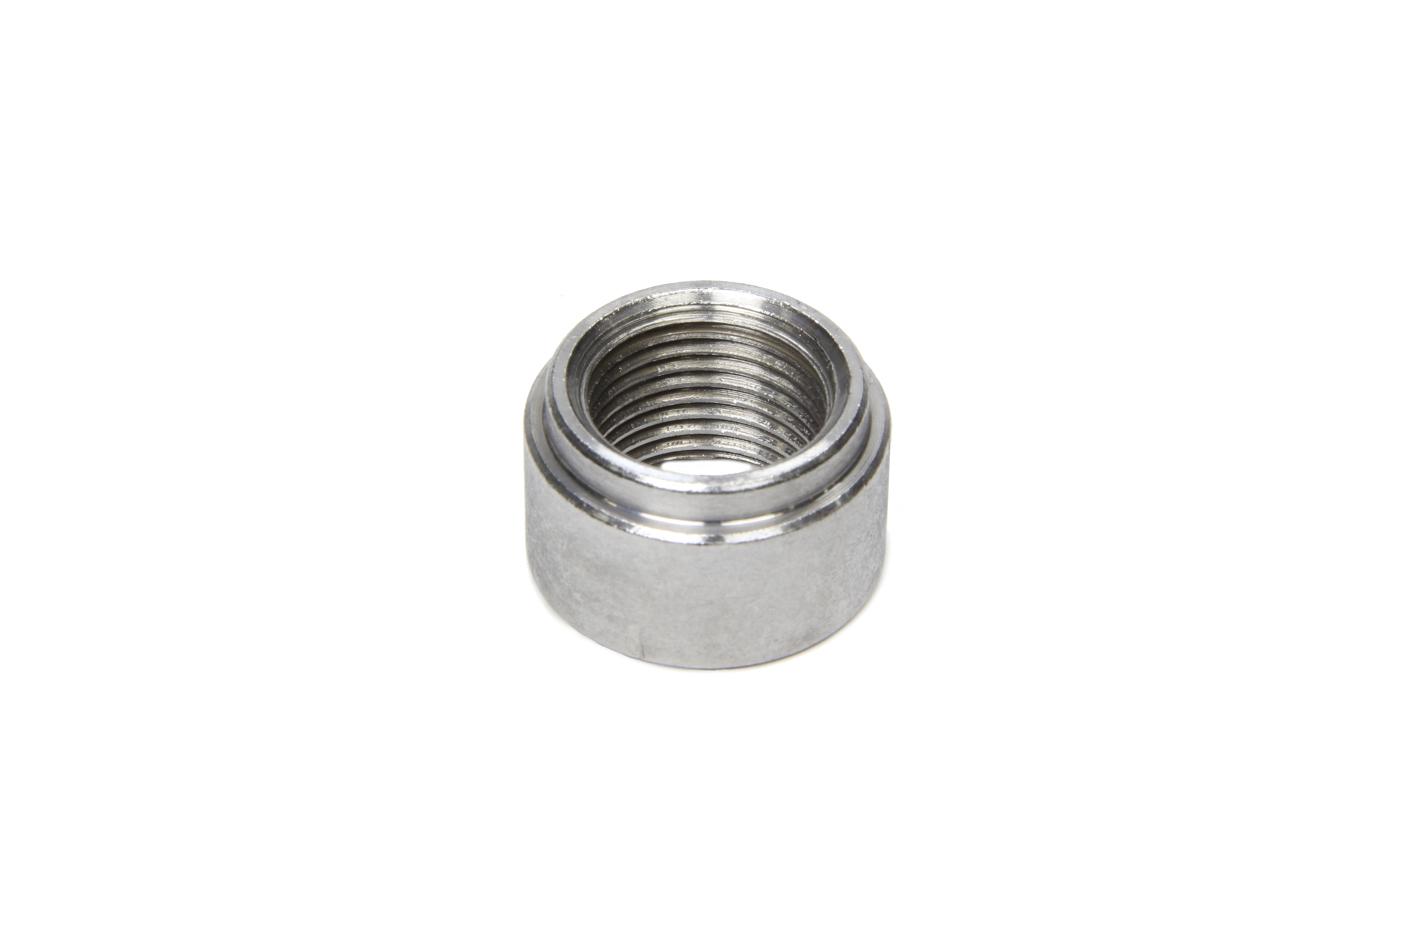 AEM 30-4005 Oxygen Sensor Bung, Weld-On, 18 mm x 1.50 Female Threads, Steel, Natural, Each